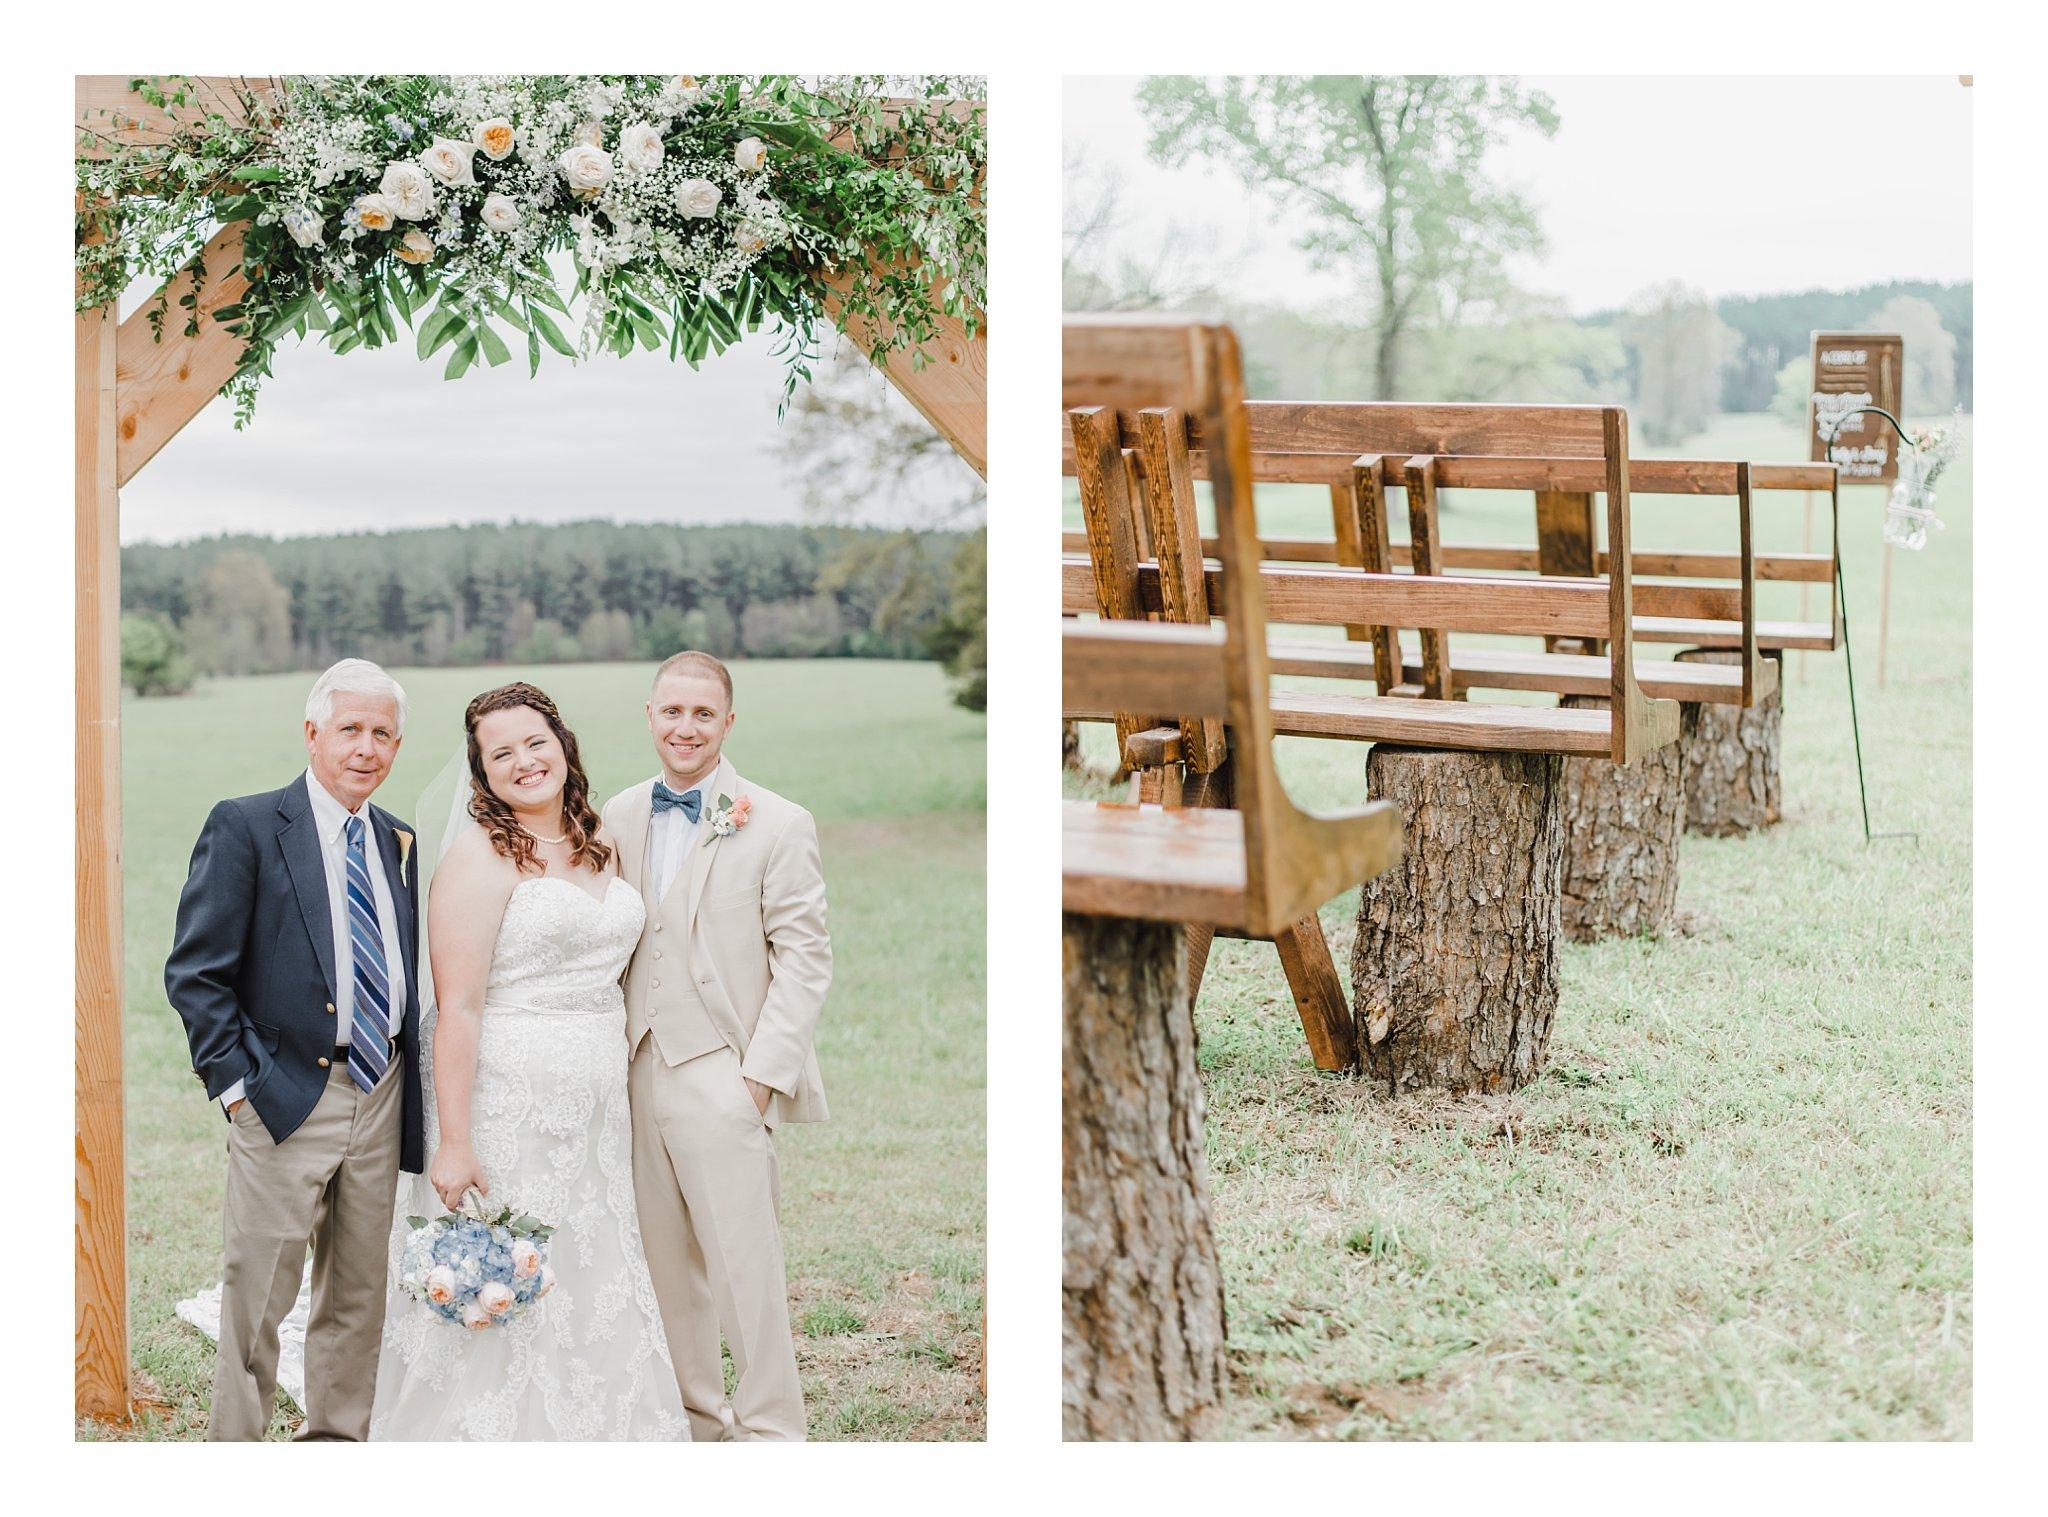 steel-blue-blush-spring-lace-gown-newberry-sc-wedding-photos-_0018.jpg